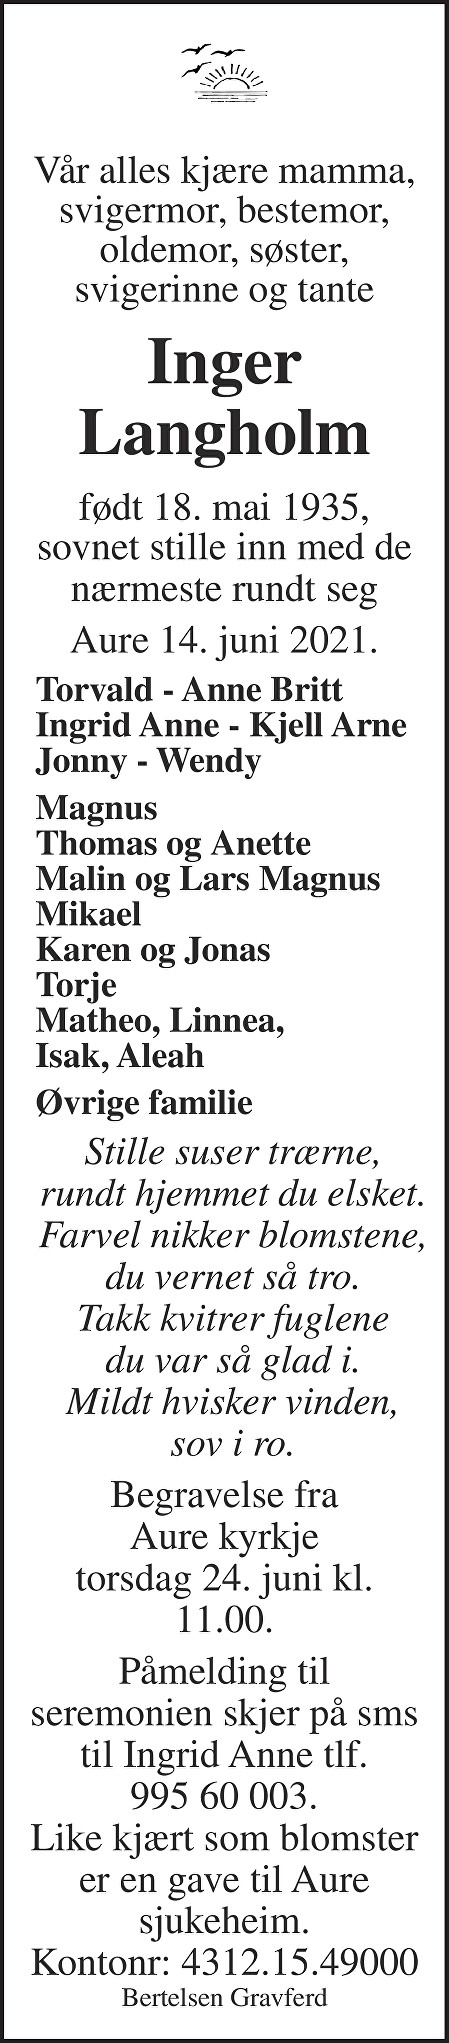 Inger Langholm Dødsannonse